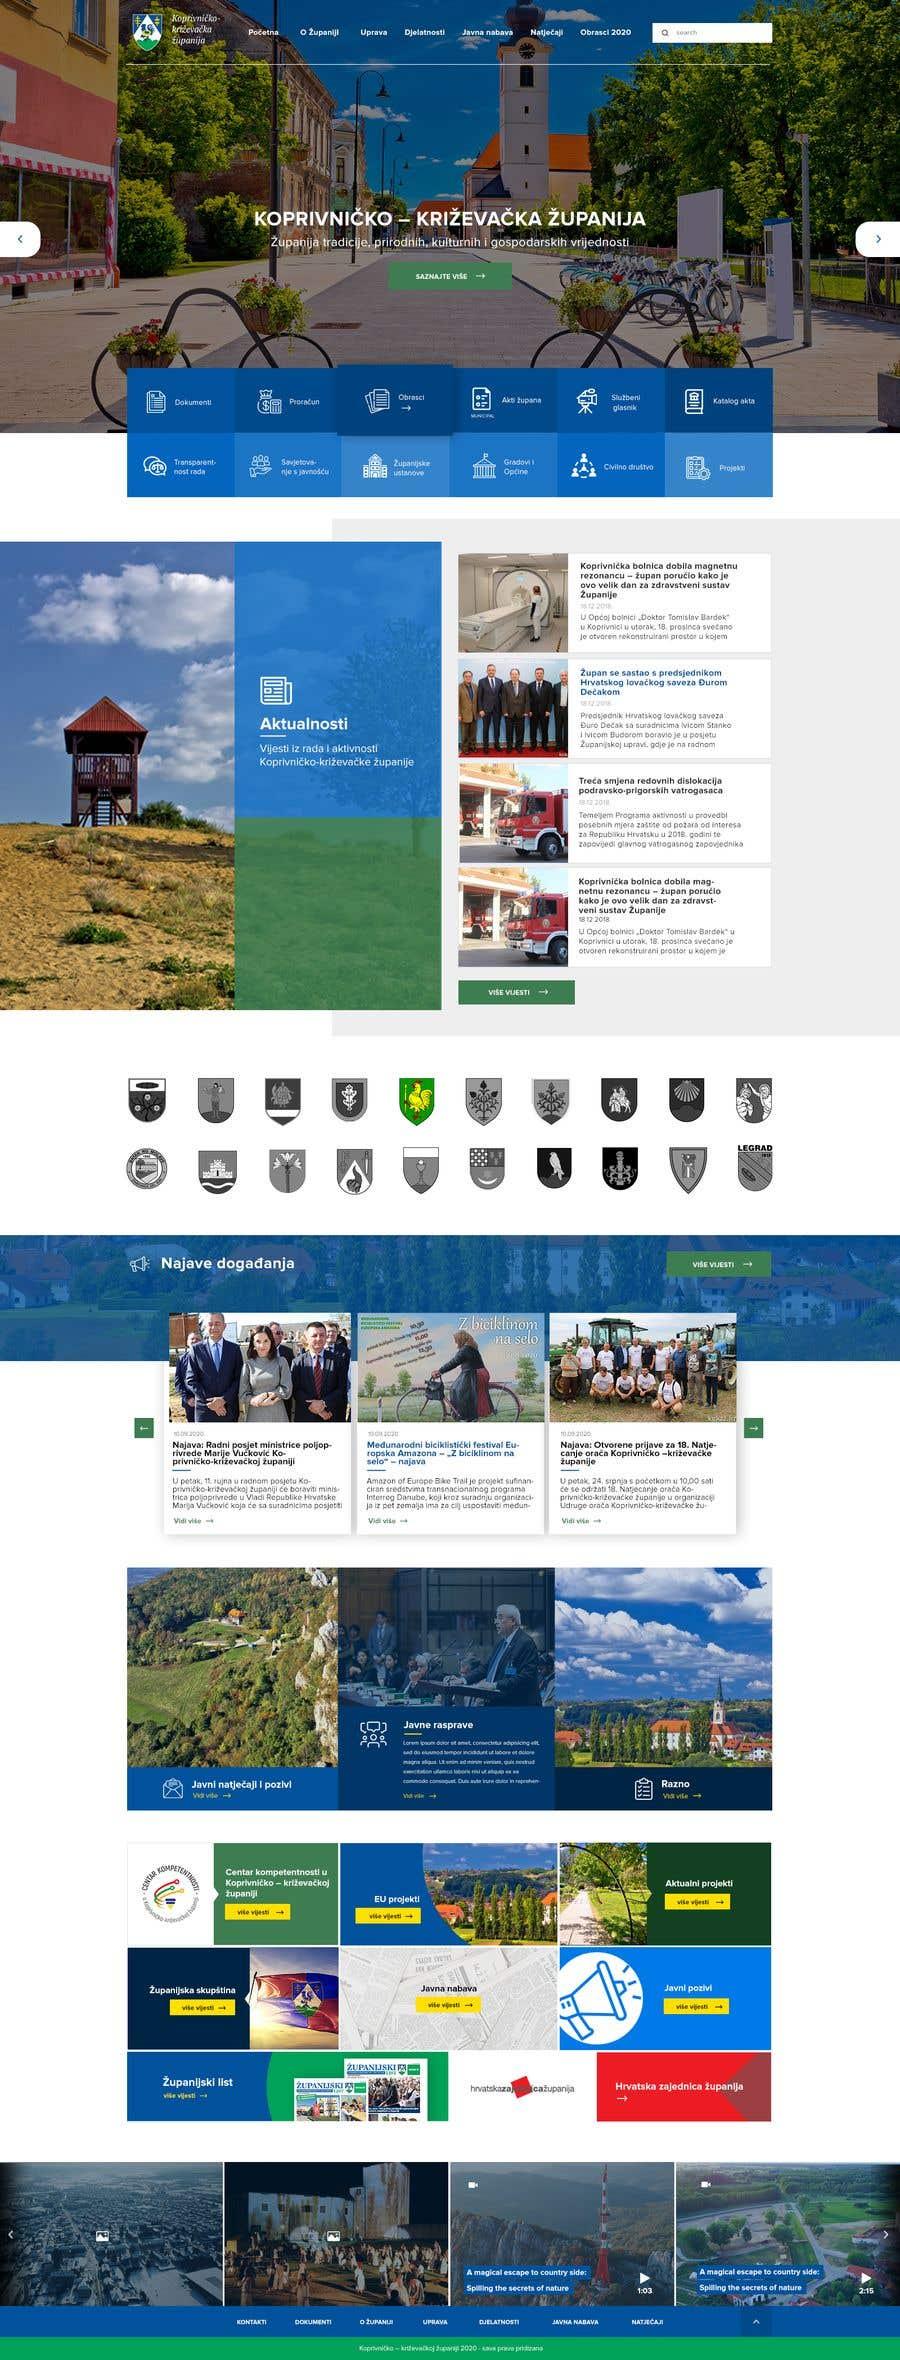 Penyertaan Peraduan #                                        65                                      untuk                                         Home page redesign project